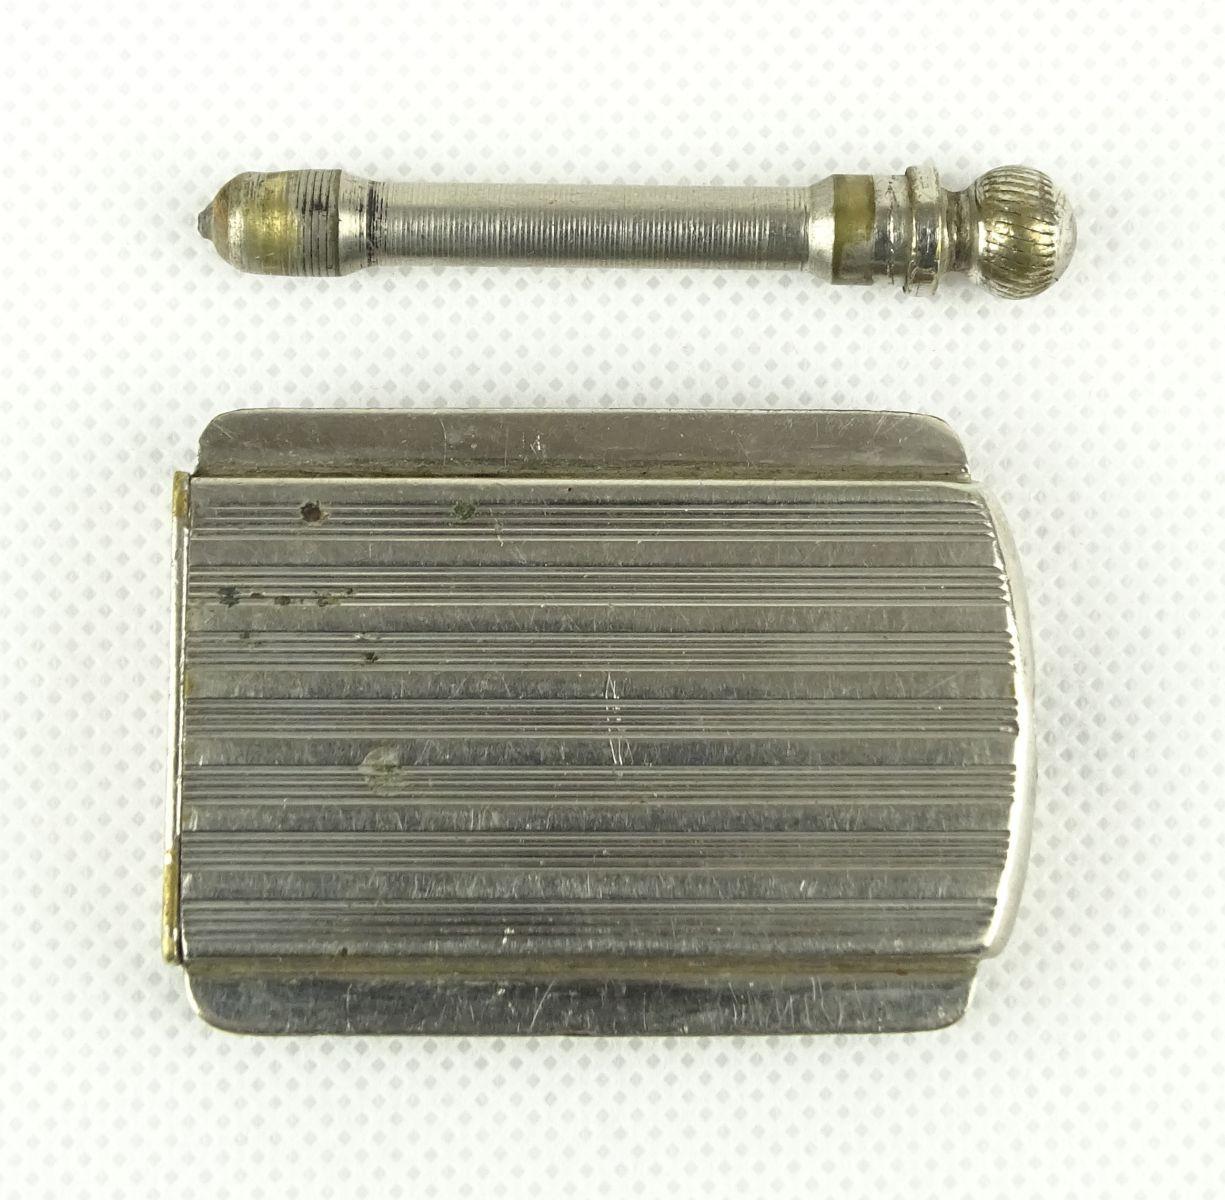 DSC00807.JPG (1225×1200)